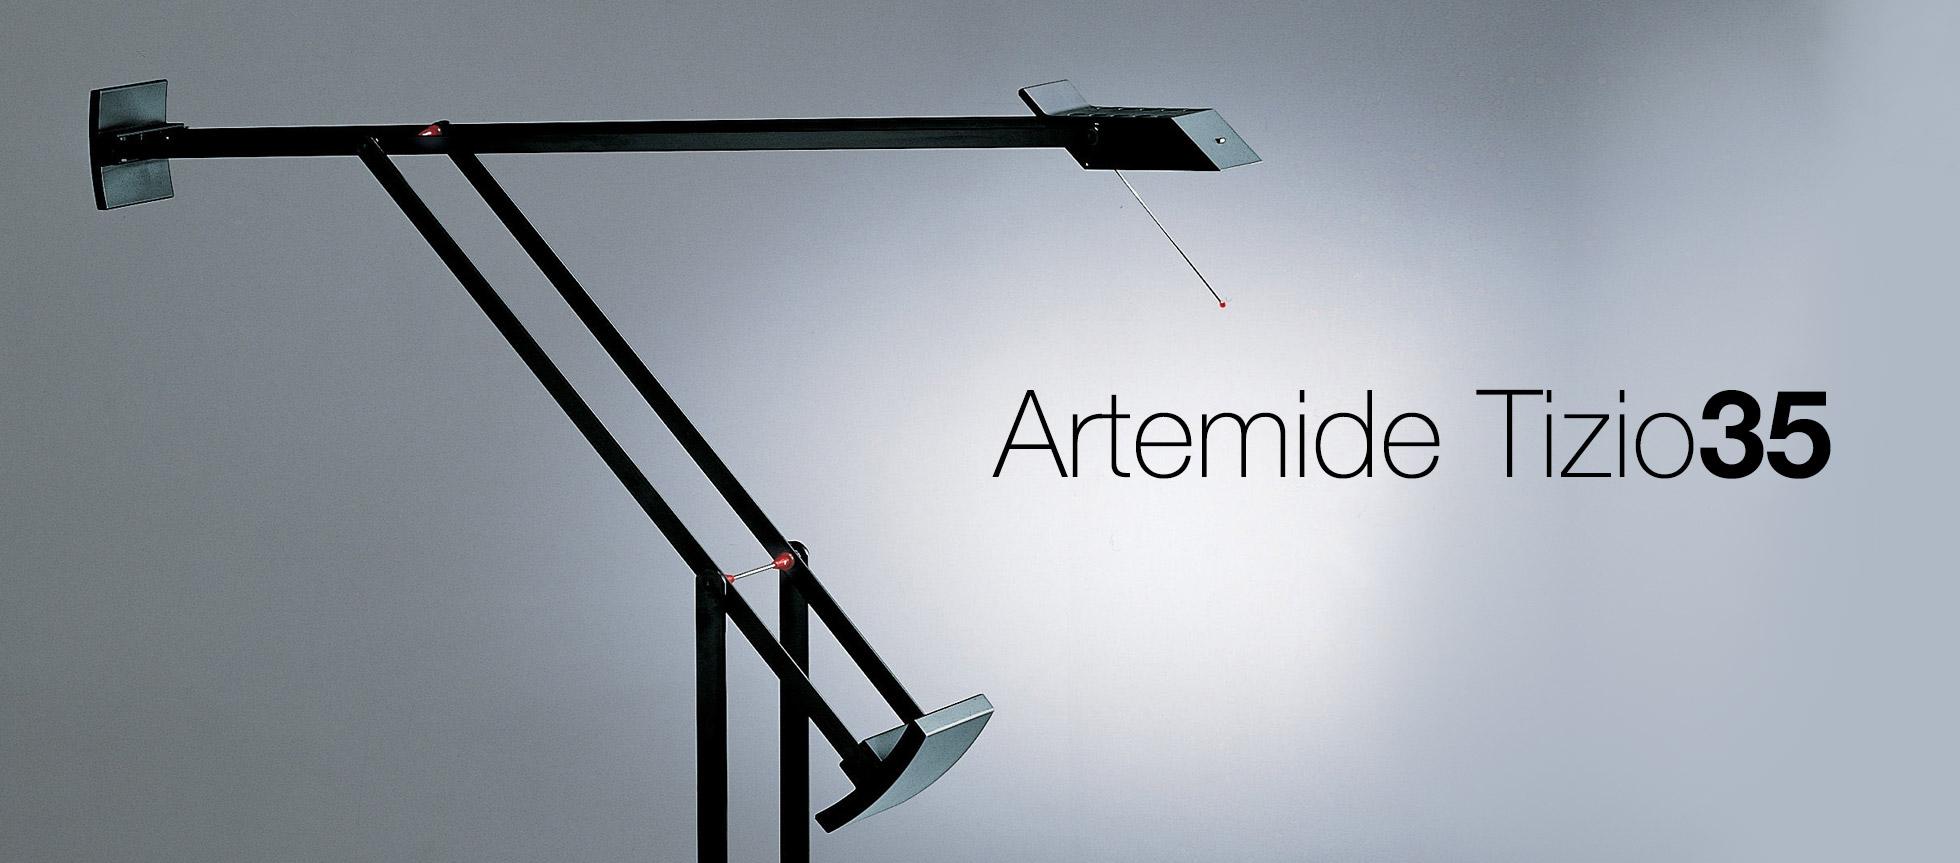 Artemide Tizio 35